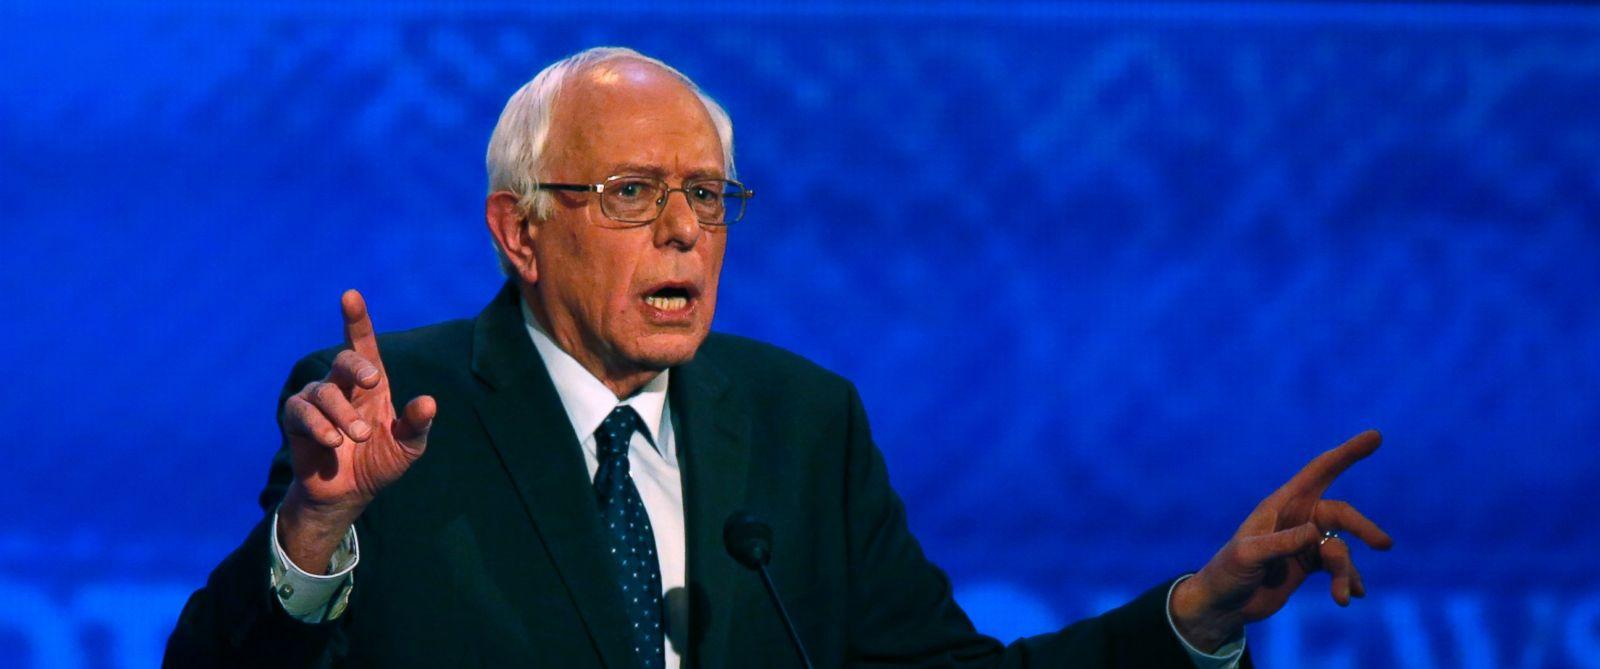 PHOTO: Bernie Sanders speaks during a Democratic presidential primary debate, Dec. 19, 2015, at Saint Anselm College in Manchester, N.H.